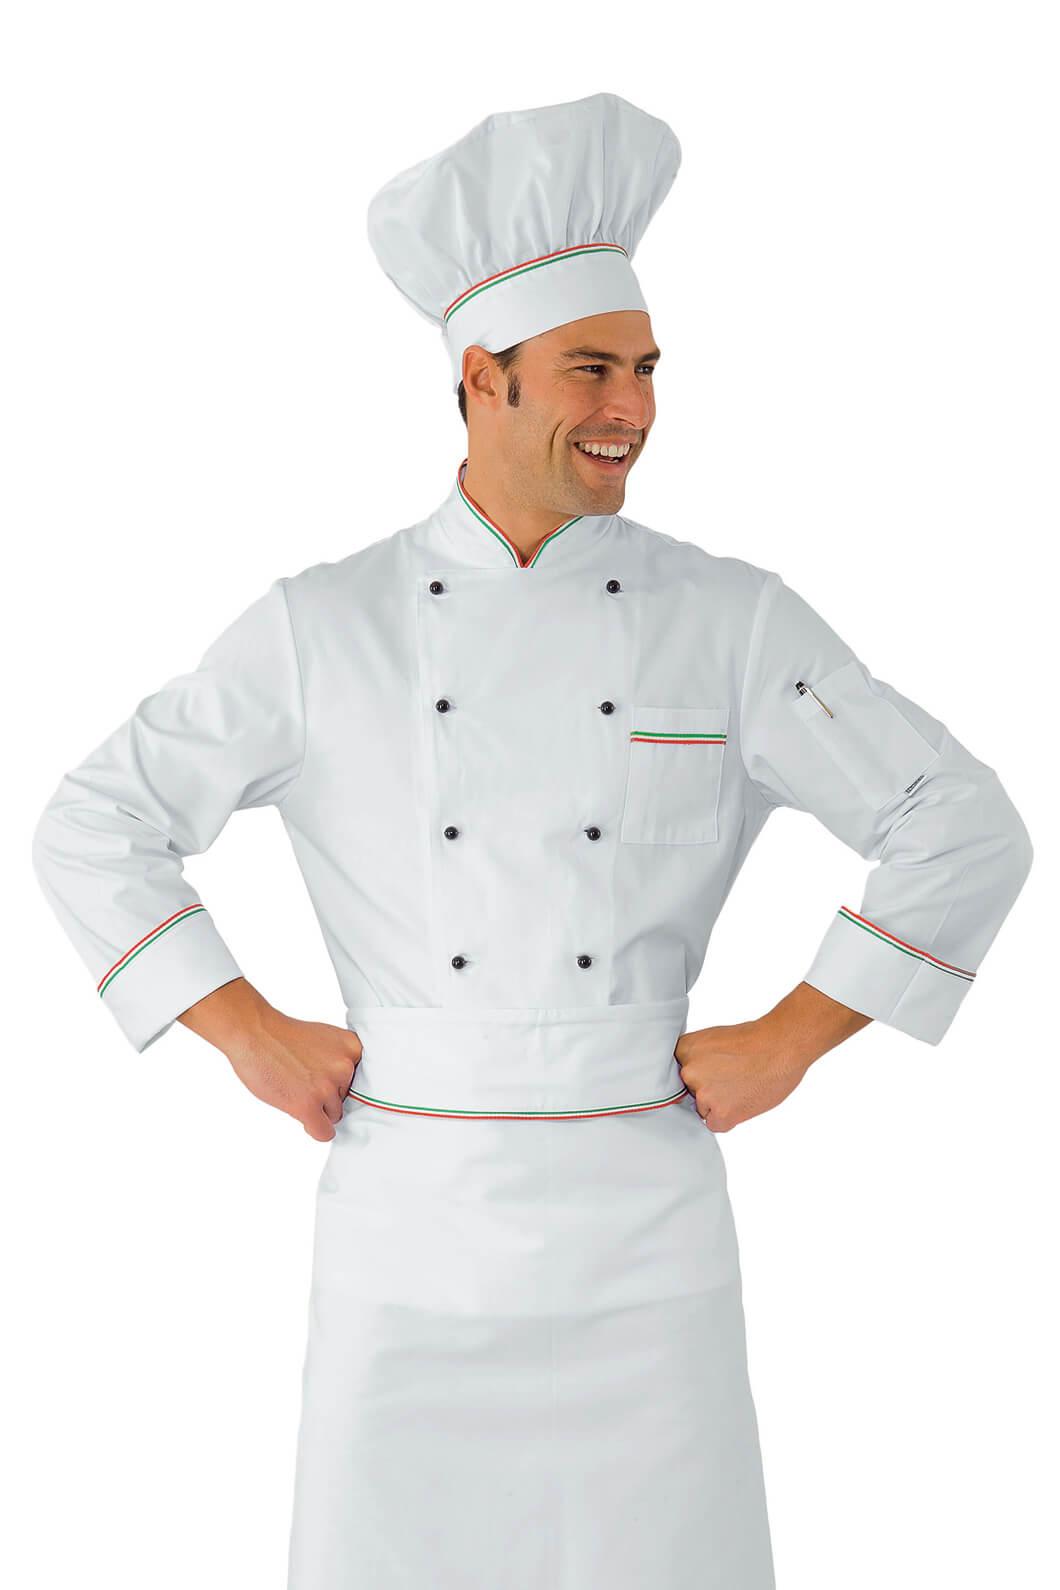 Veste chef cuisinier prestige blanc liser tricolore 100 for Cuisinier 71